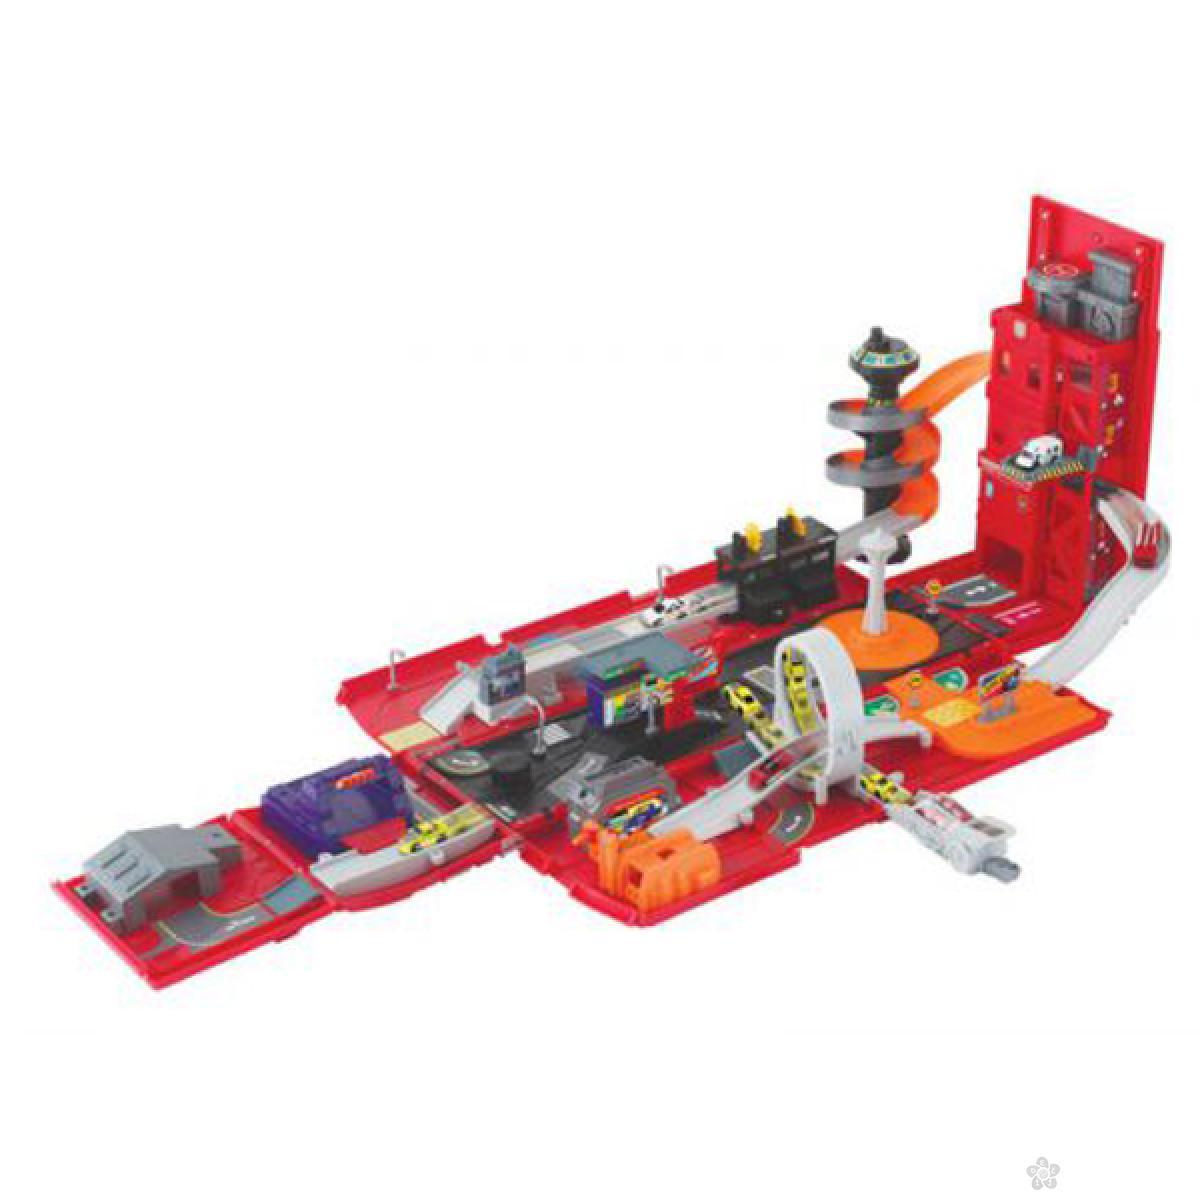 Metalni transformers, 25/78114A